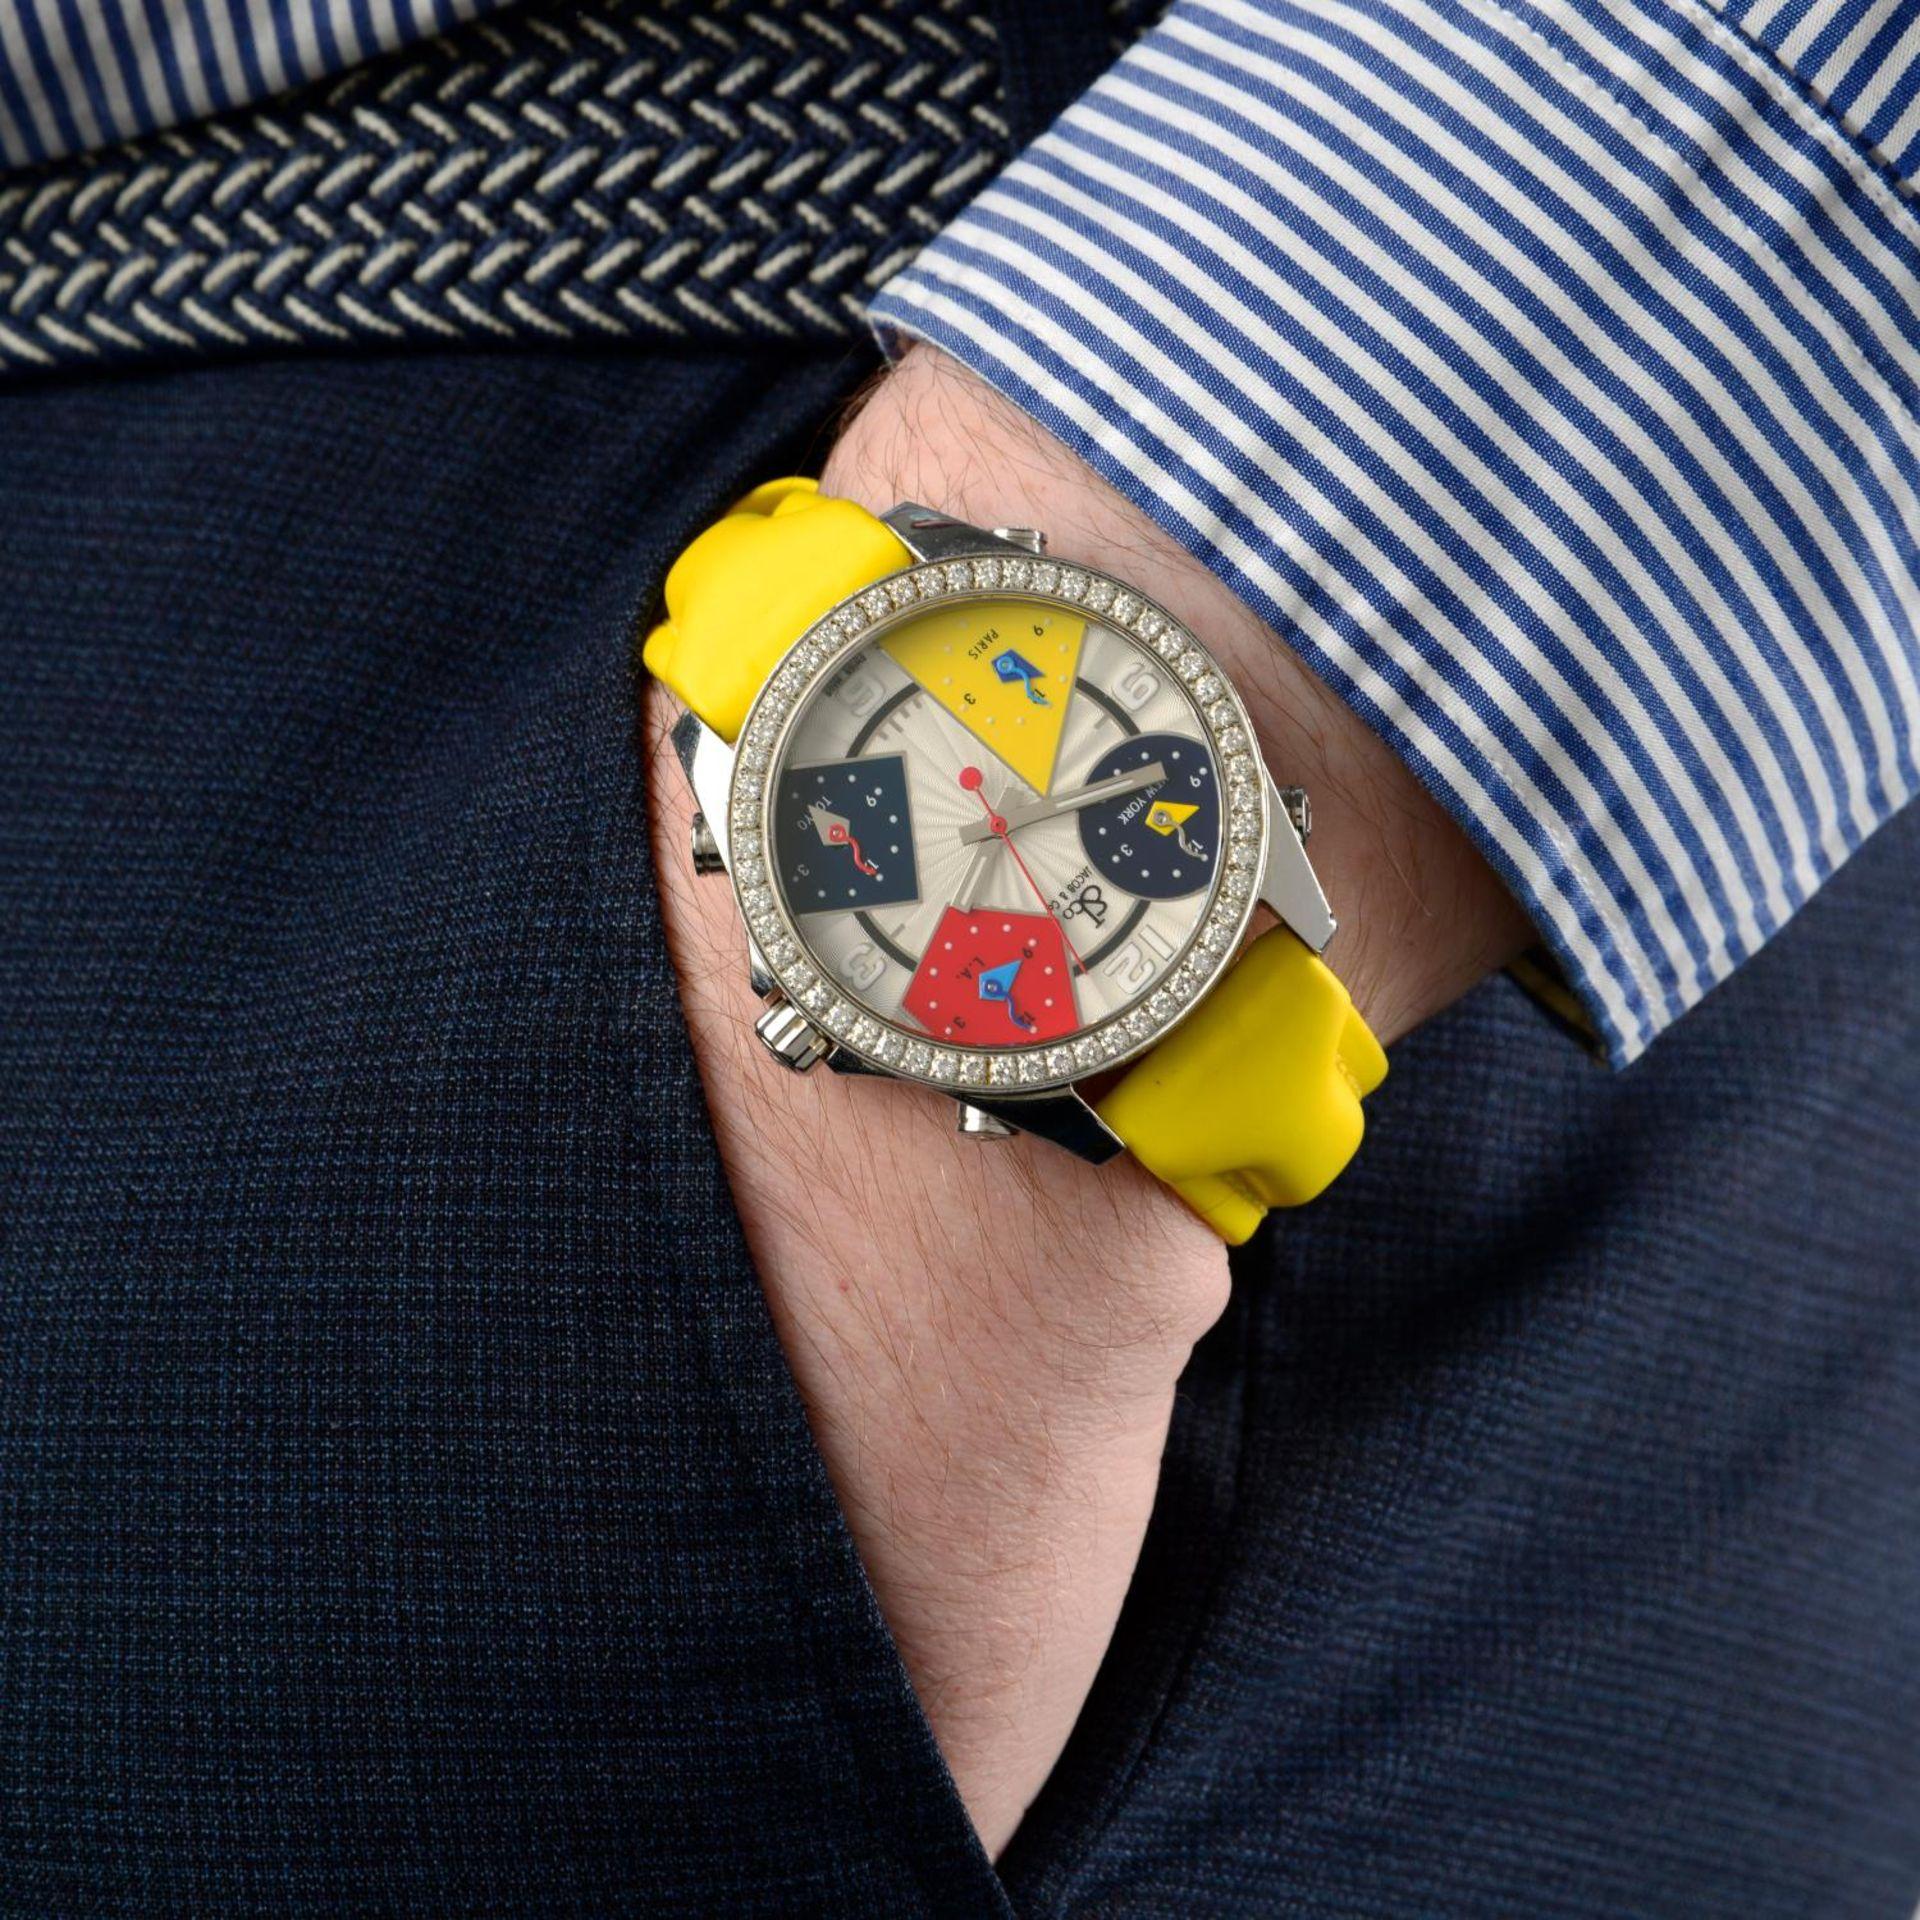 JACOB & CO. - a Five Time Zone wrist watch. - Bild 7 aus 8